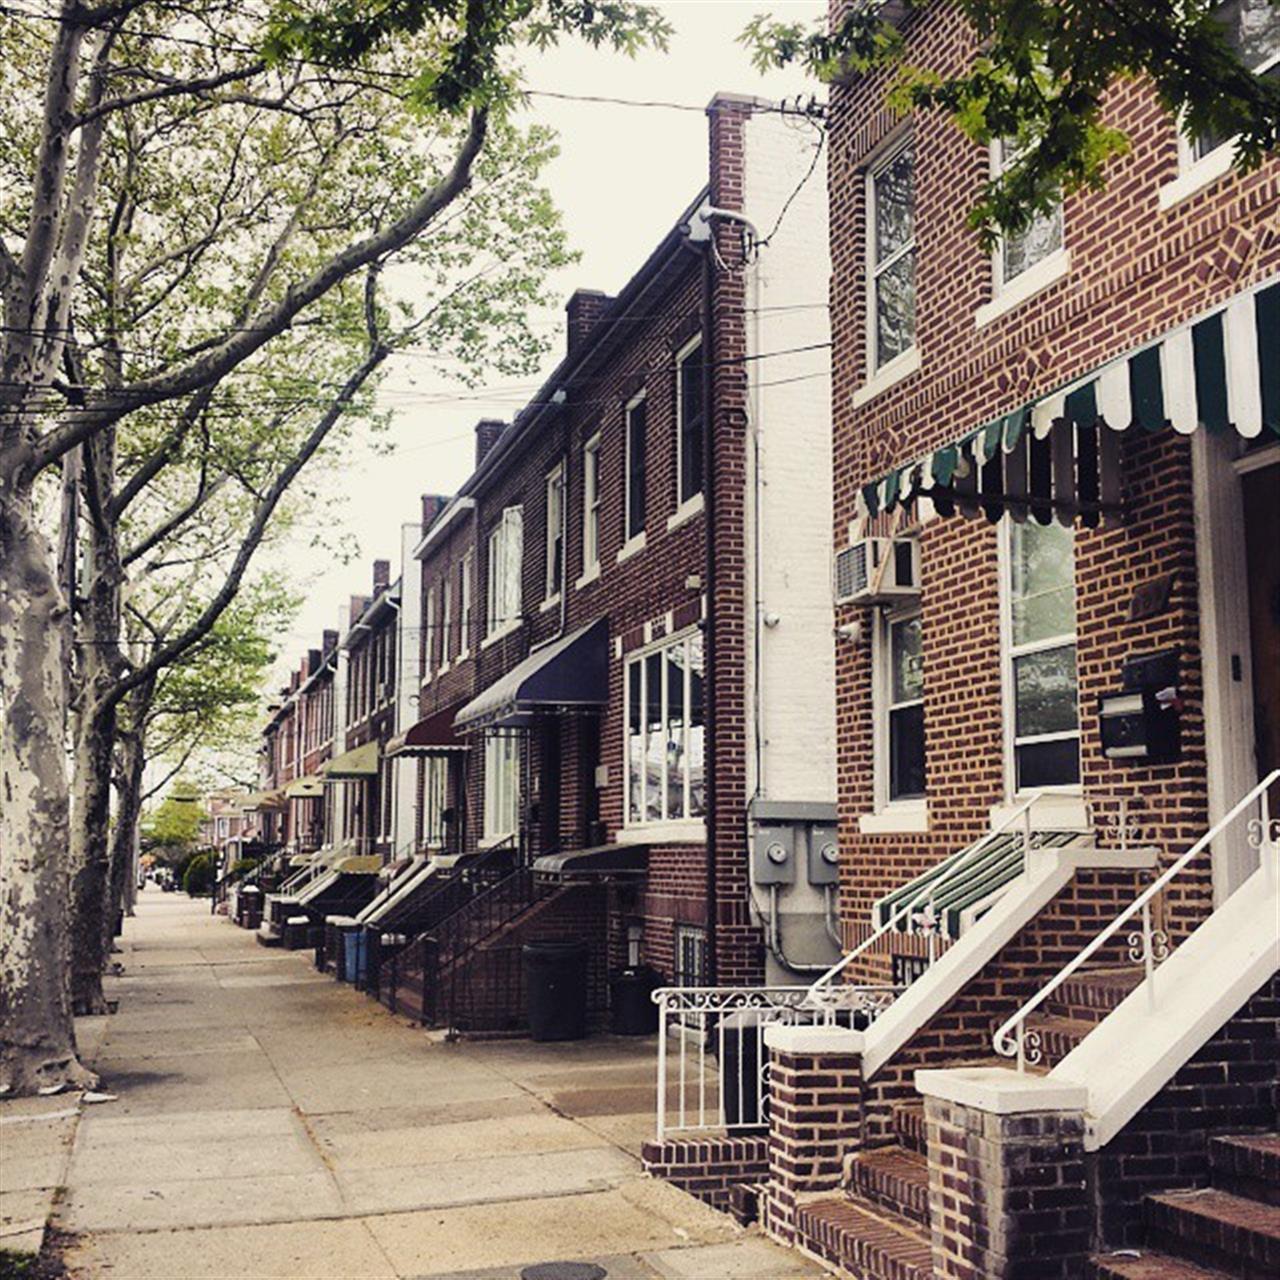 Avenue W #nyc #gravesend #avenuew #brooklyn #usa #city #urban #cityscape #bkoriginal #leadingRElocal